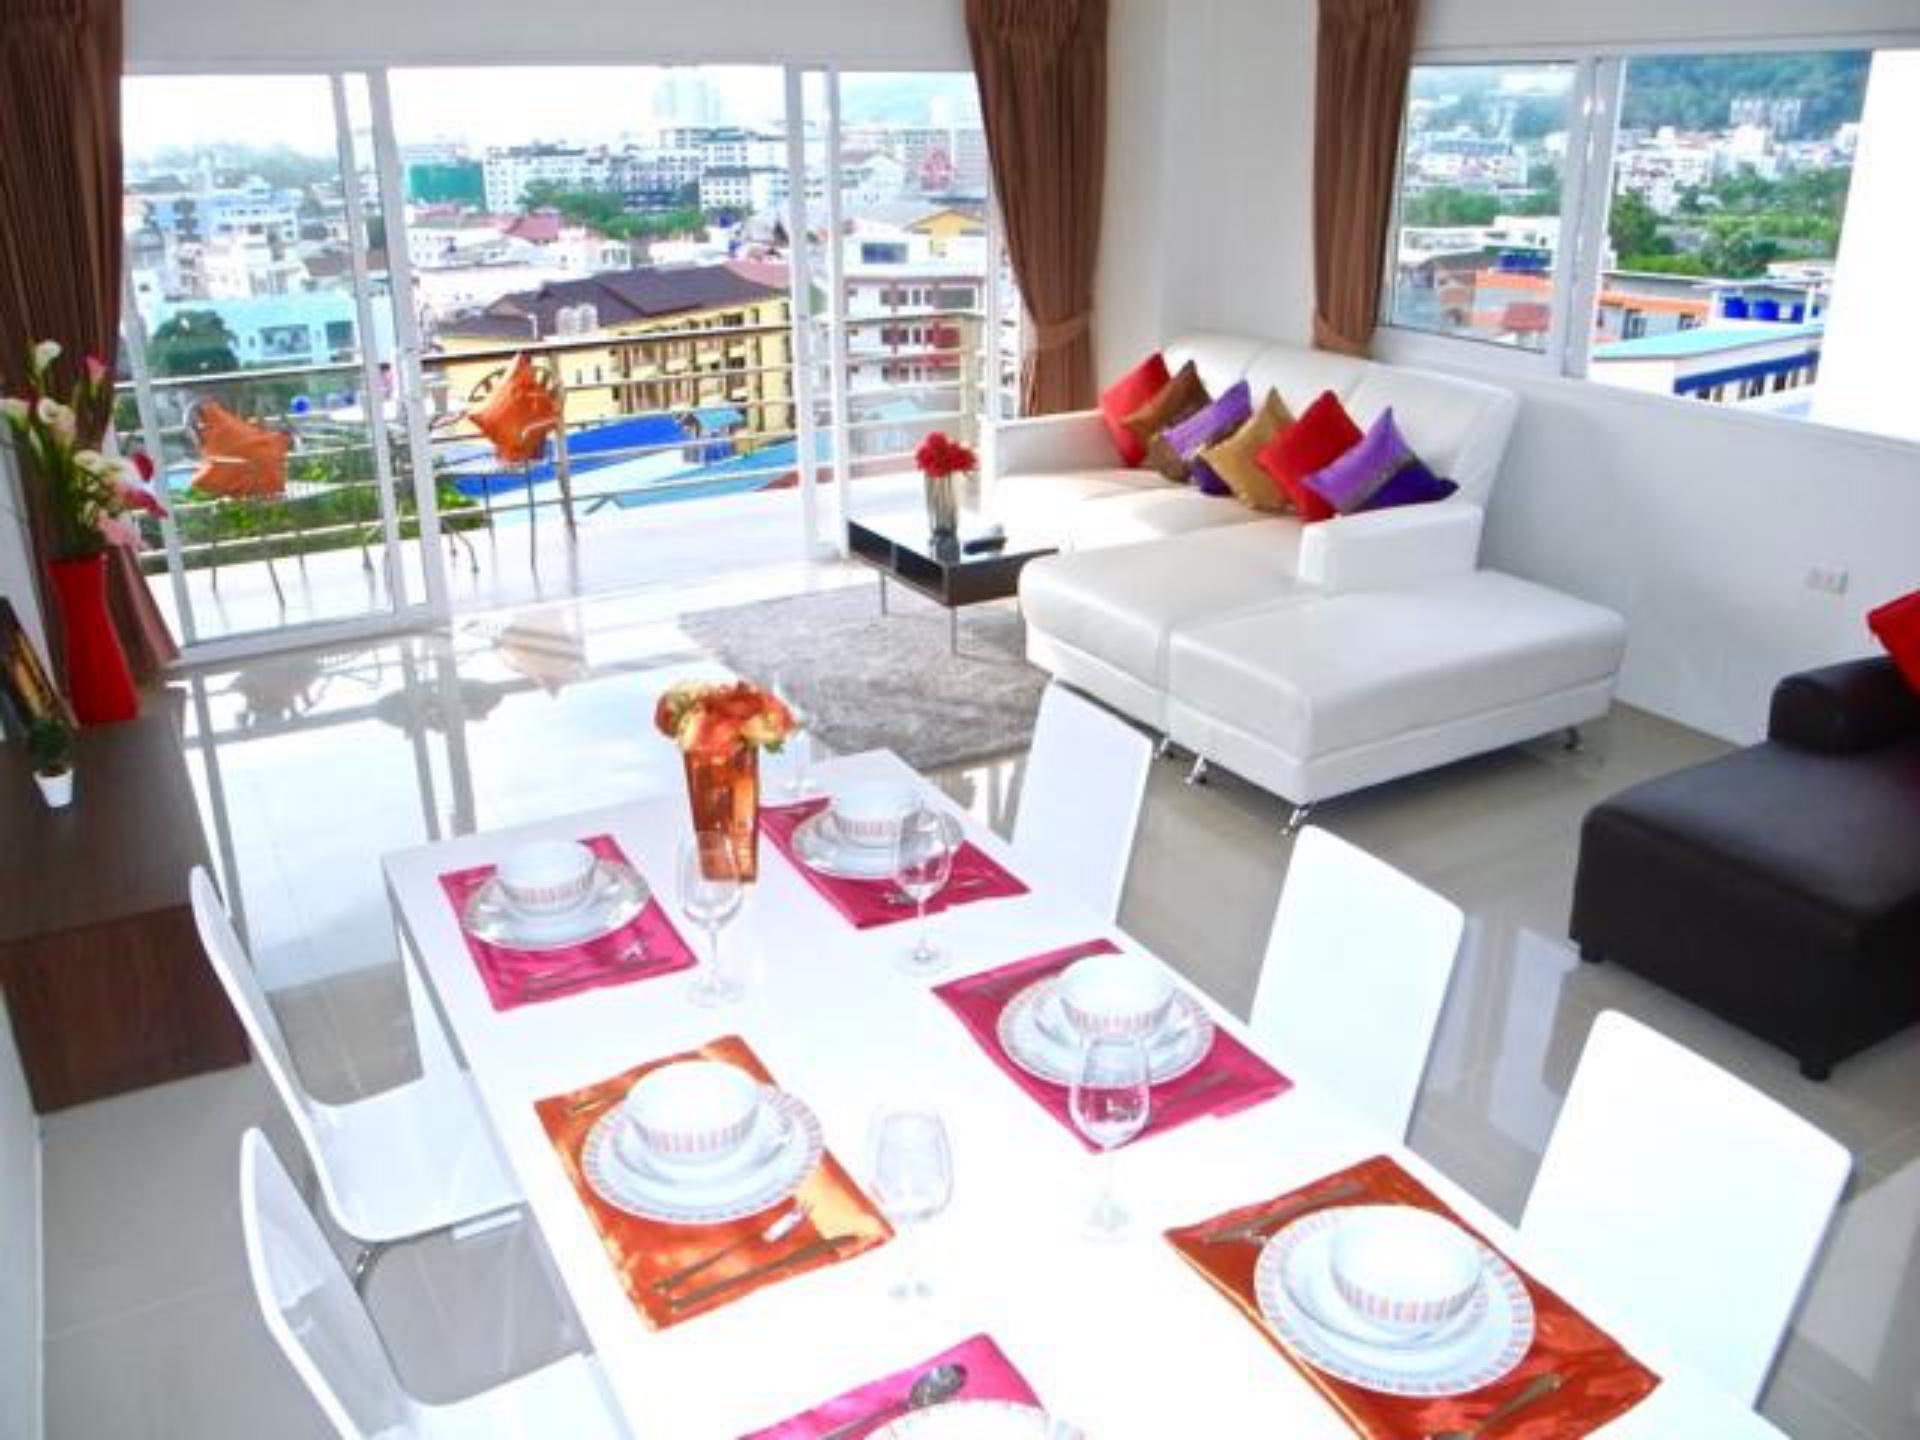 New Sea Views apartment in Patong อพาร์ตเมนต์ 2 ห้องนอน 1 ห้องน้ำส่วนตัว ขนาด 127 ตร.ม. – ป่าตอง